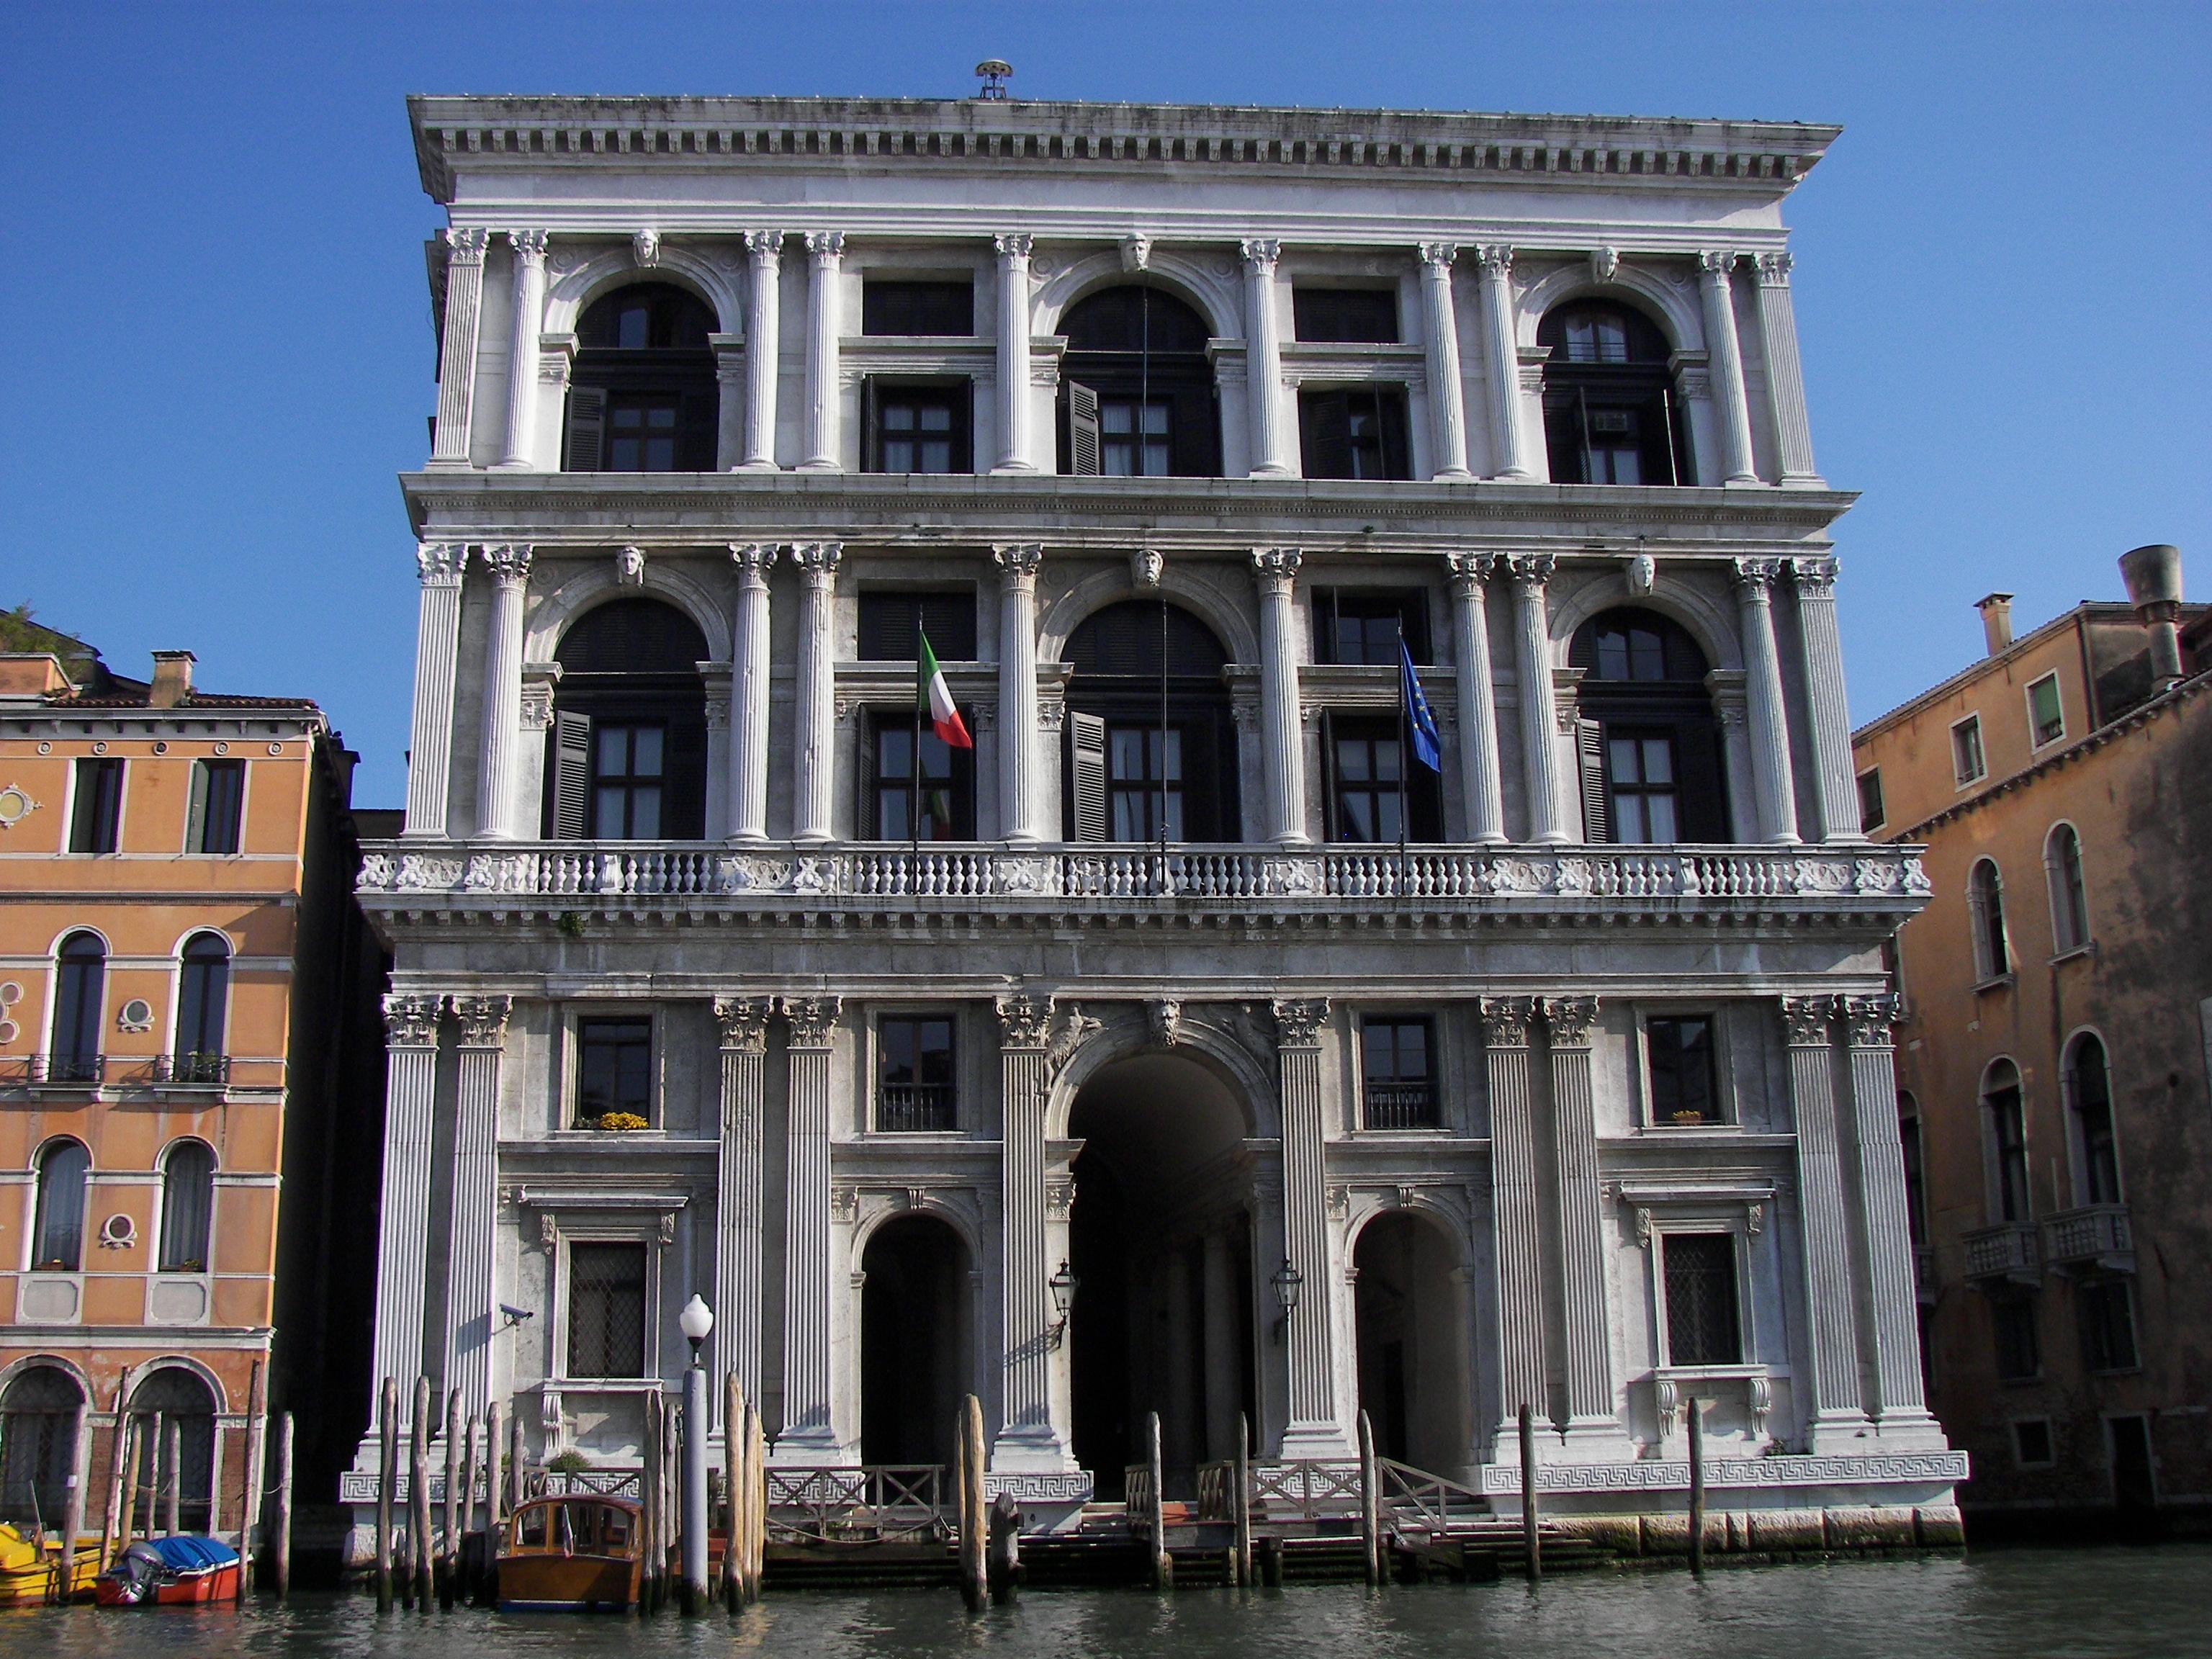 Palazzo Grimani di San Luca File:palazzo Grimani di San